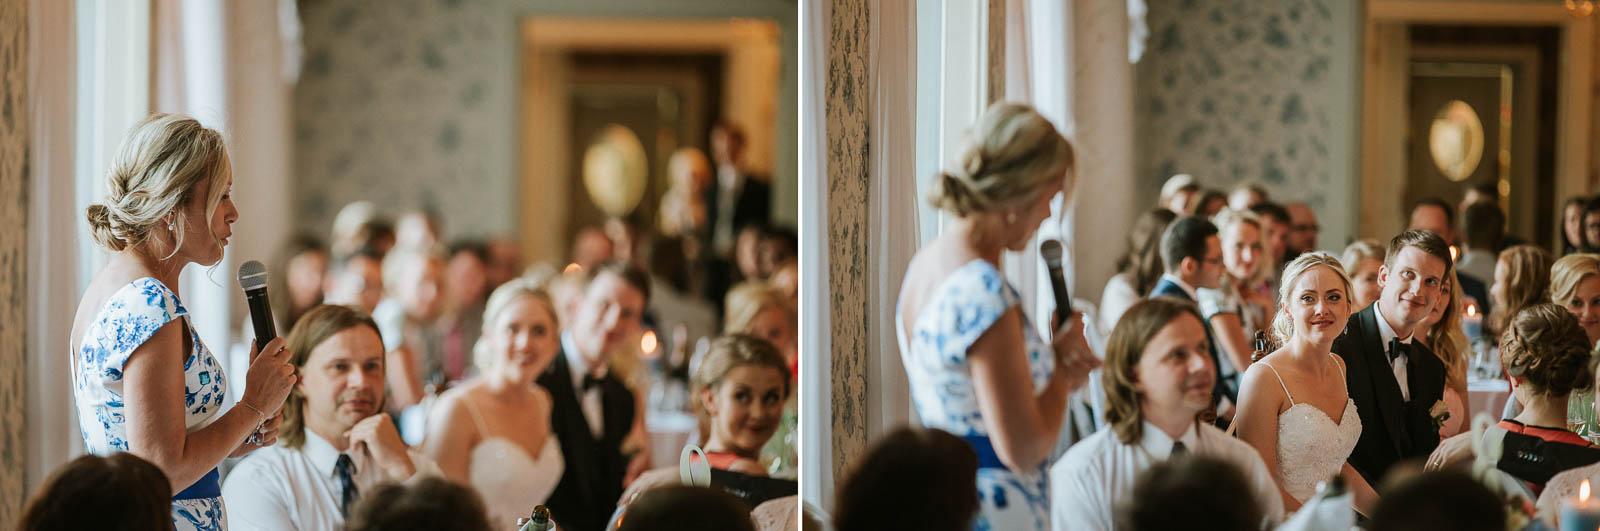 Liisa-Andreas-pulm-padise-mois-manor-055